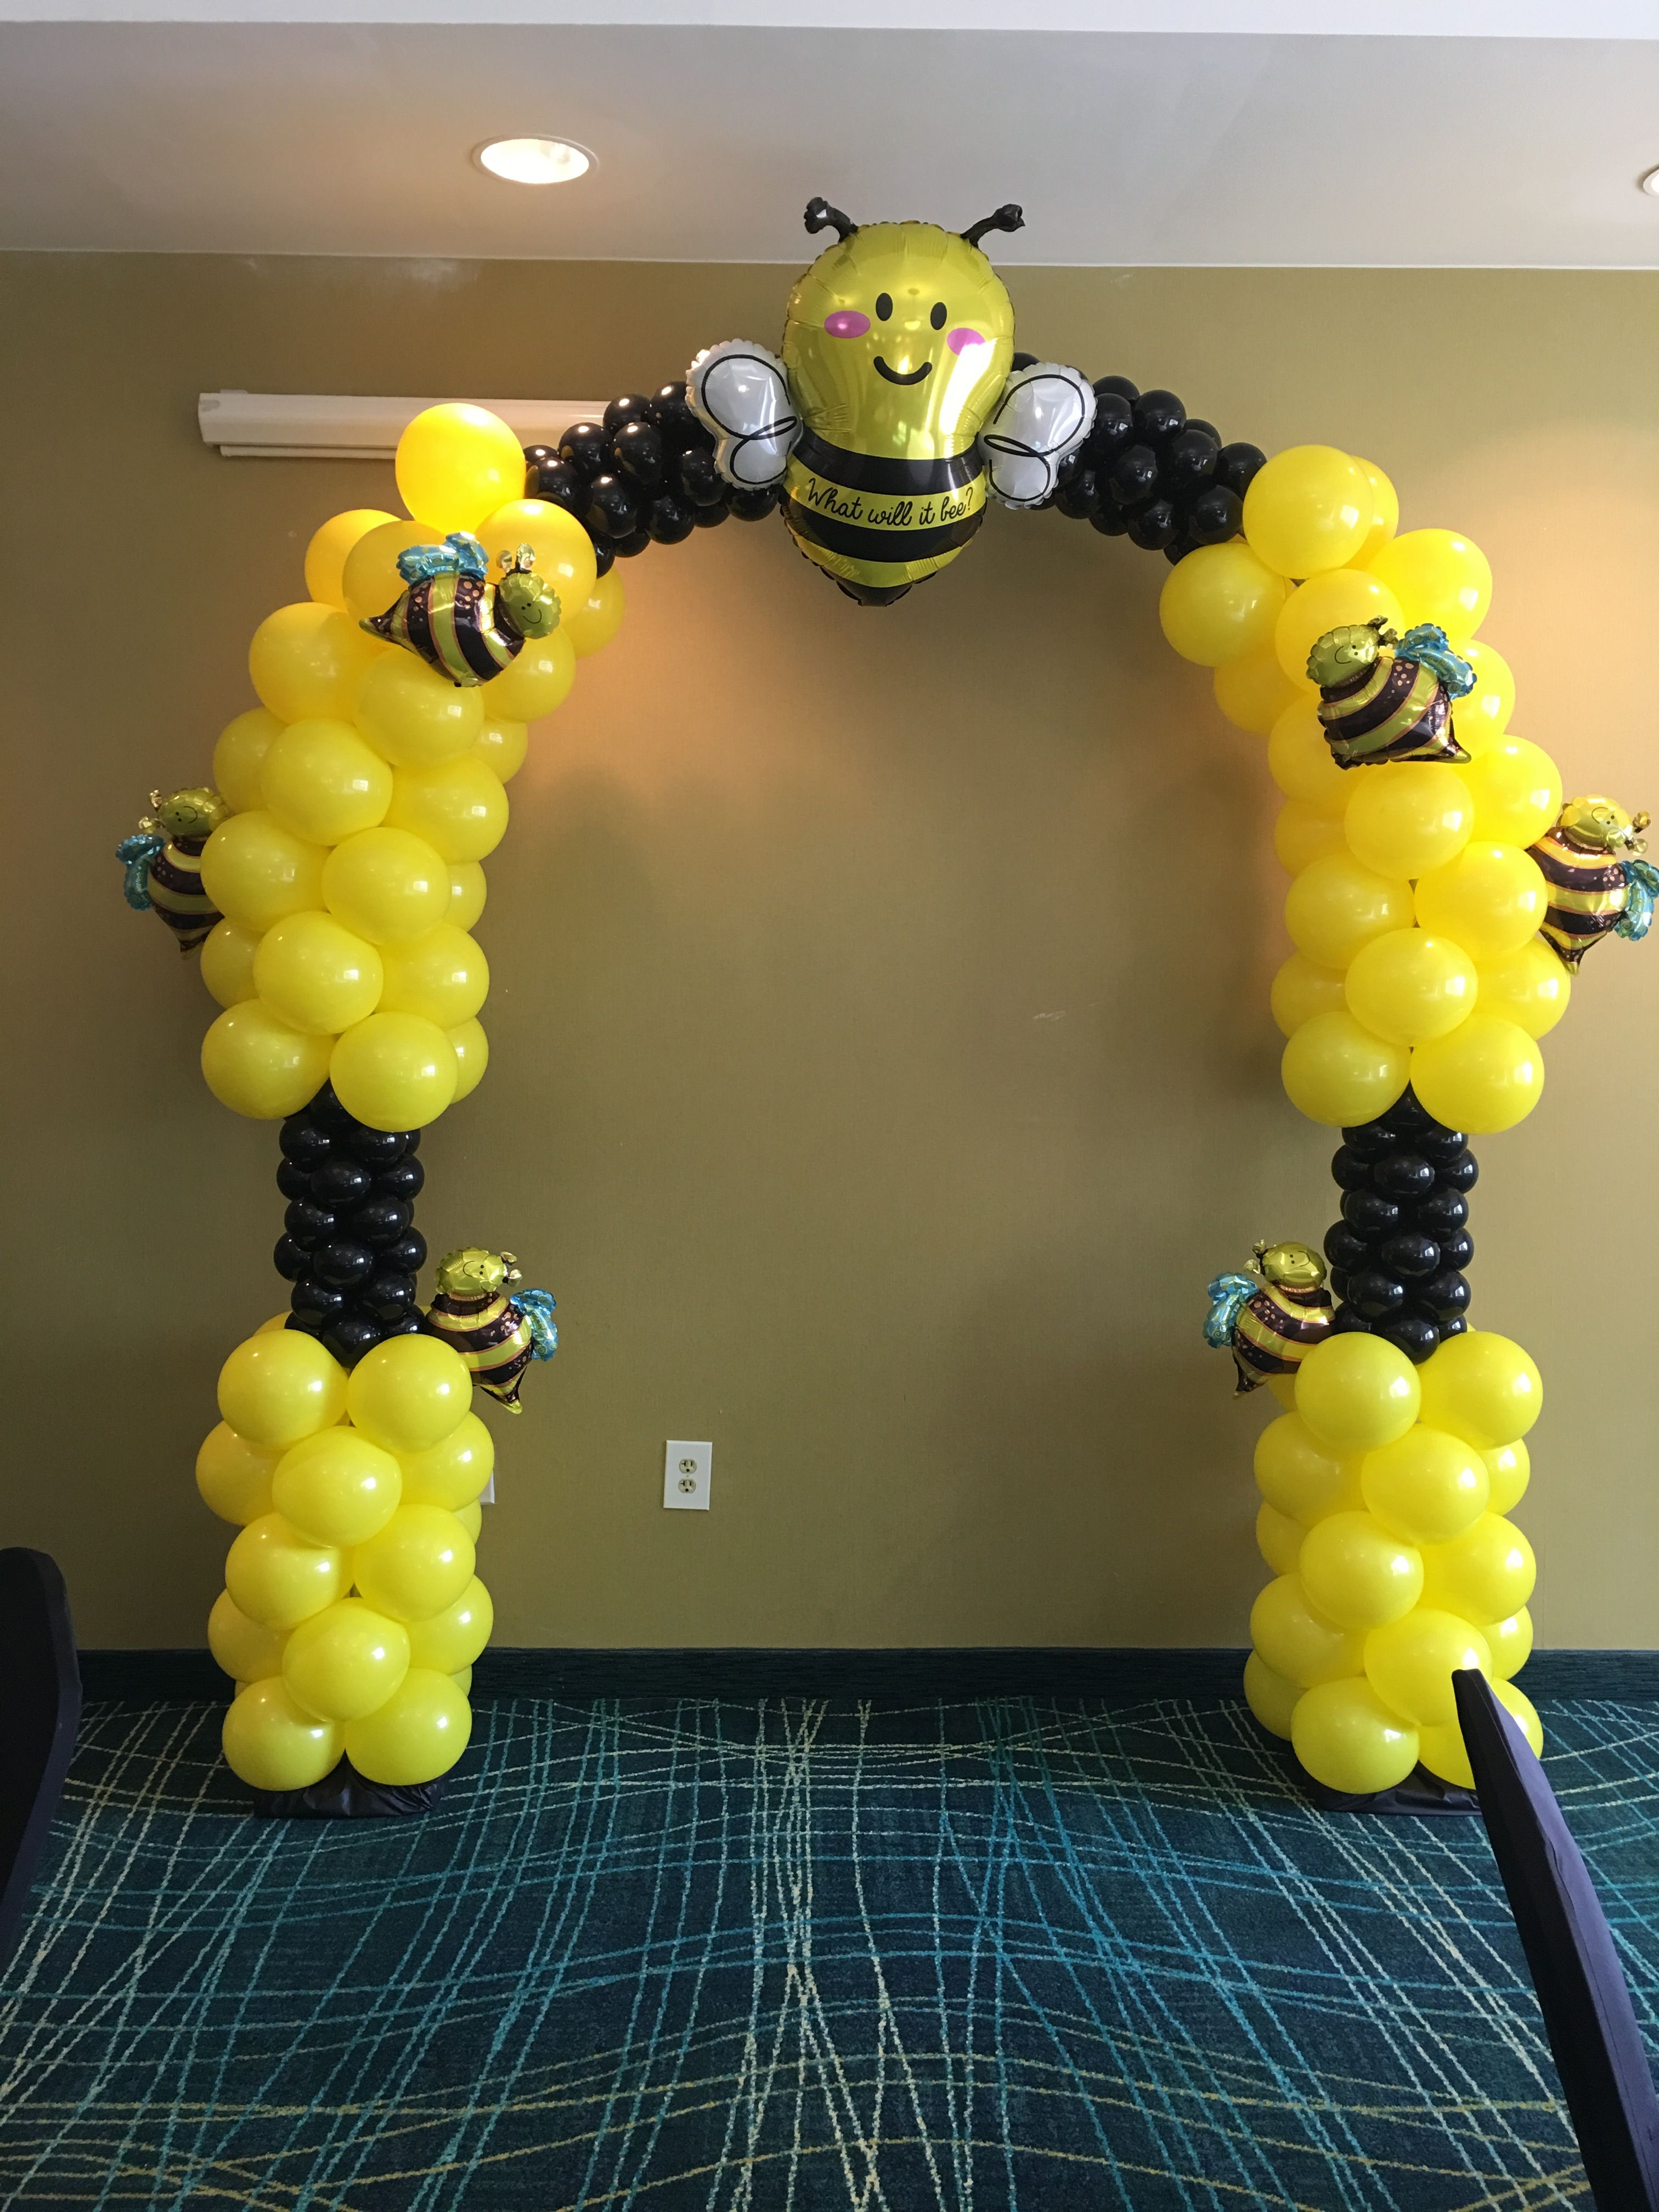 Bumblebee Balloon Arch Balloon Arches Pinterest Balloons